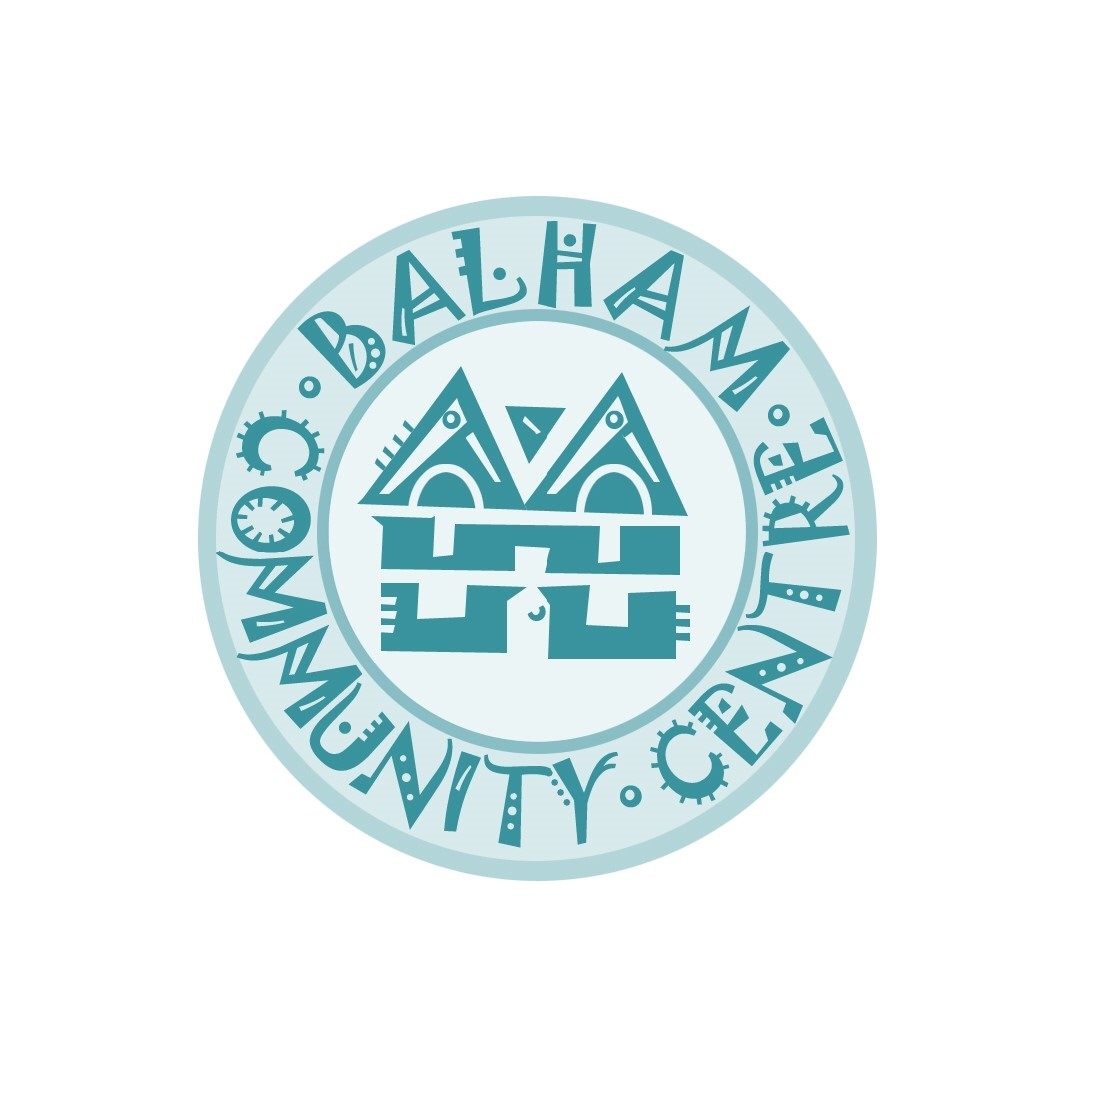 Balham Community Centre